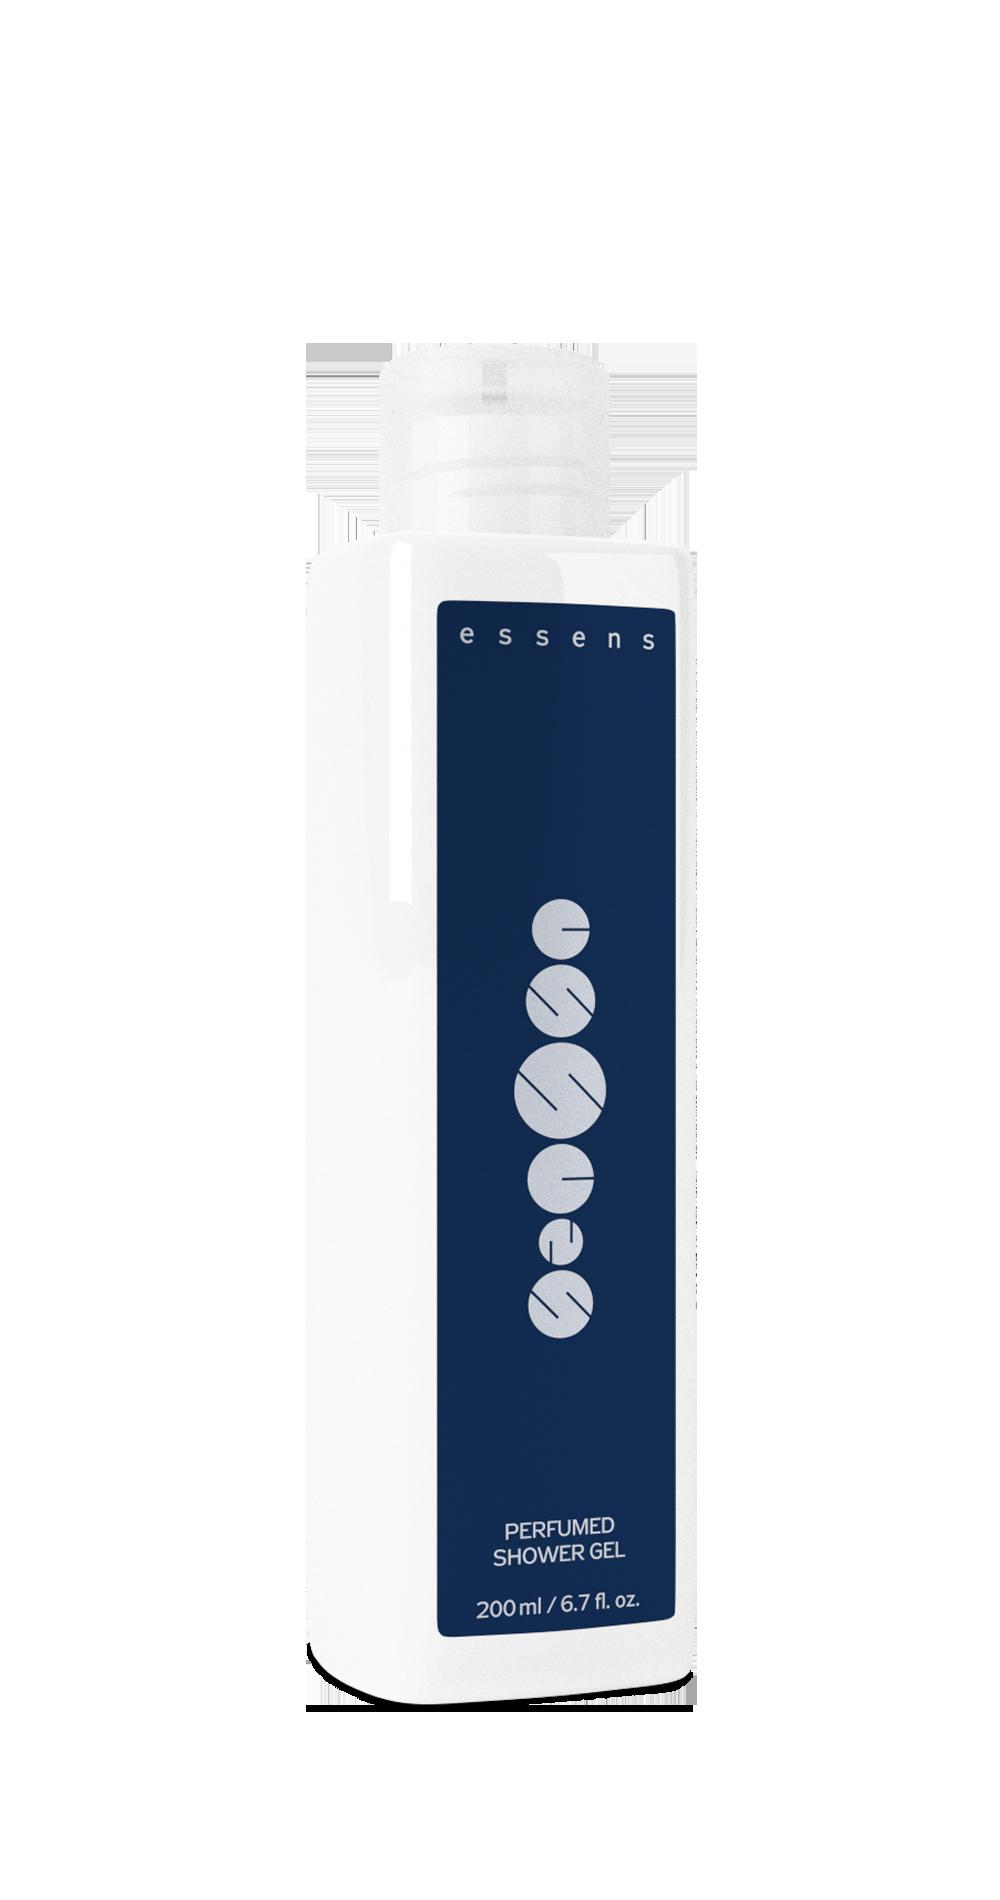 ESSENS m003 Objem: Sprchový gel 200ml